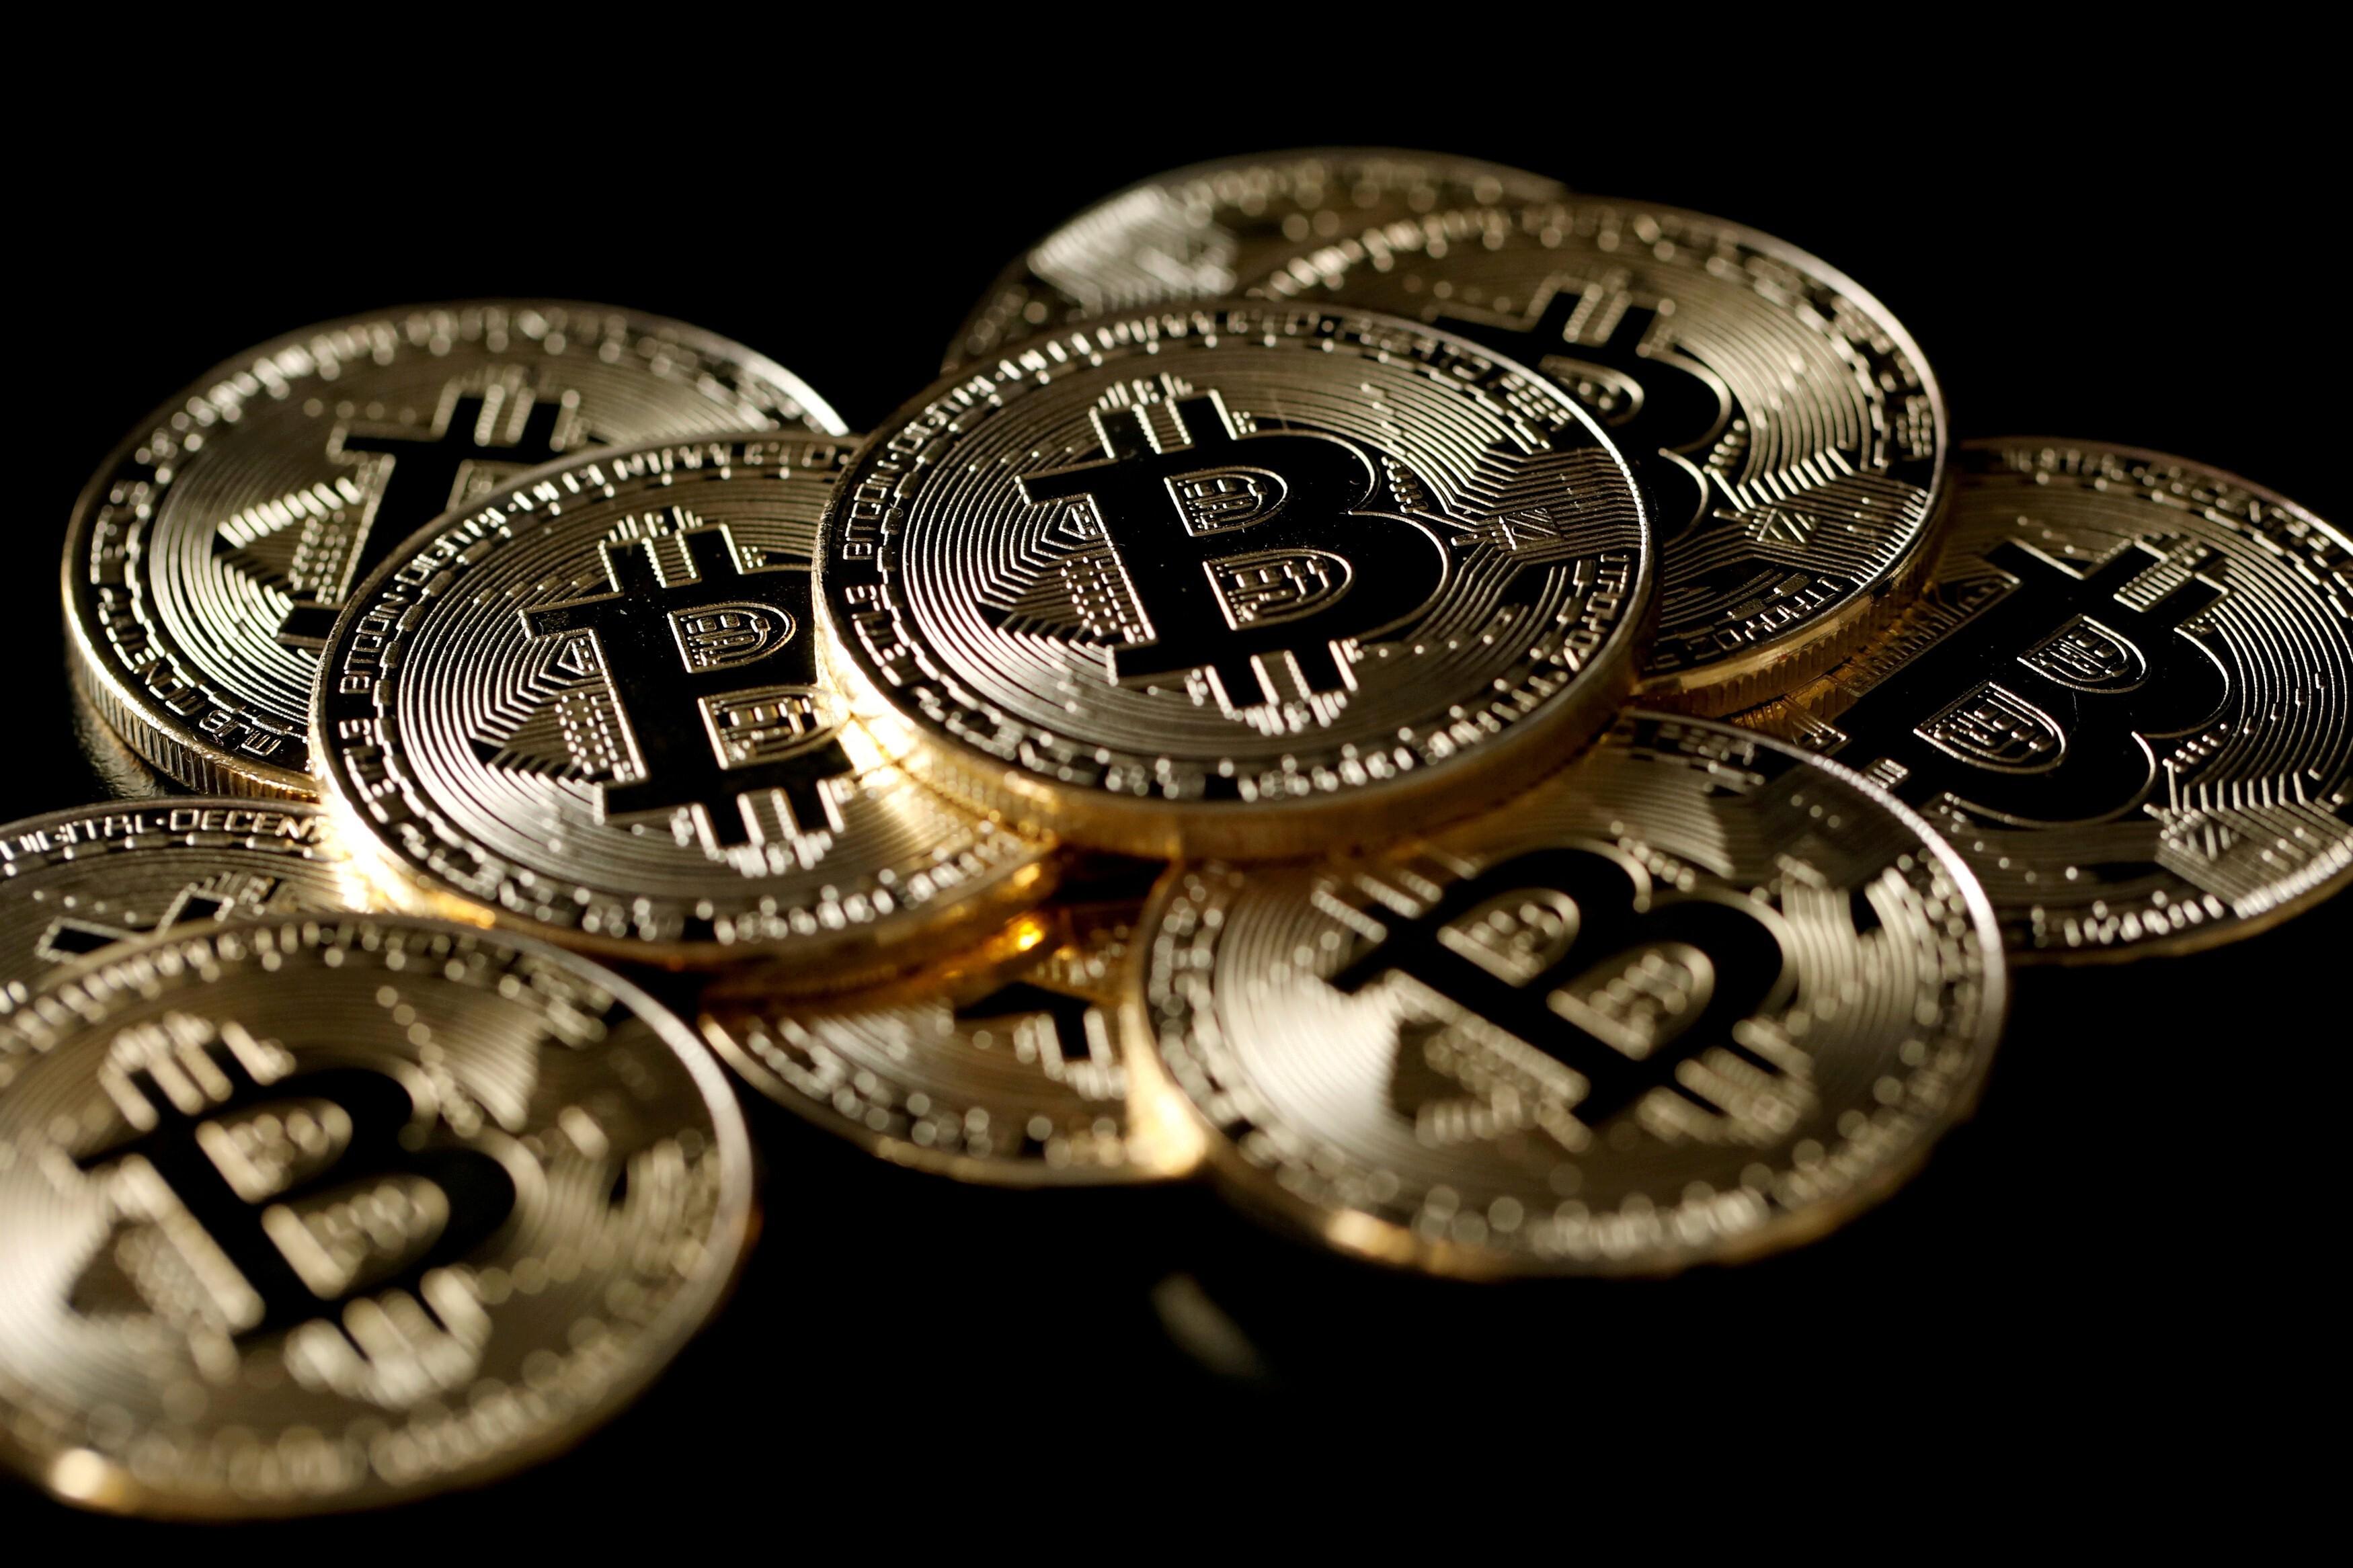 margine commerciando bitcoin us)